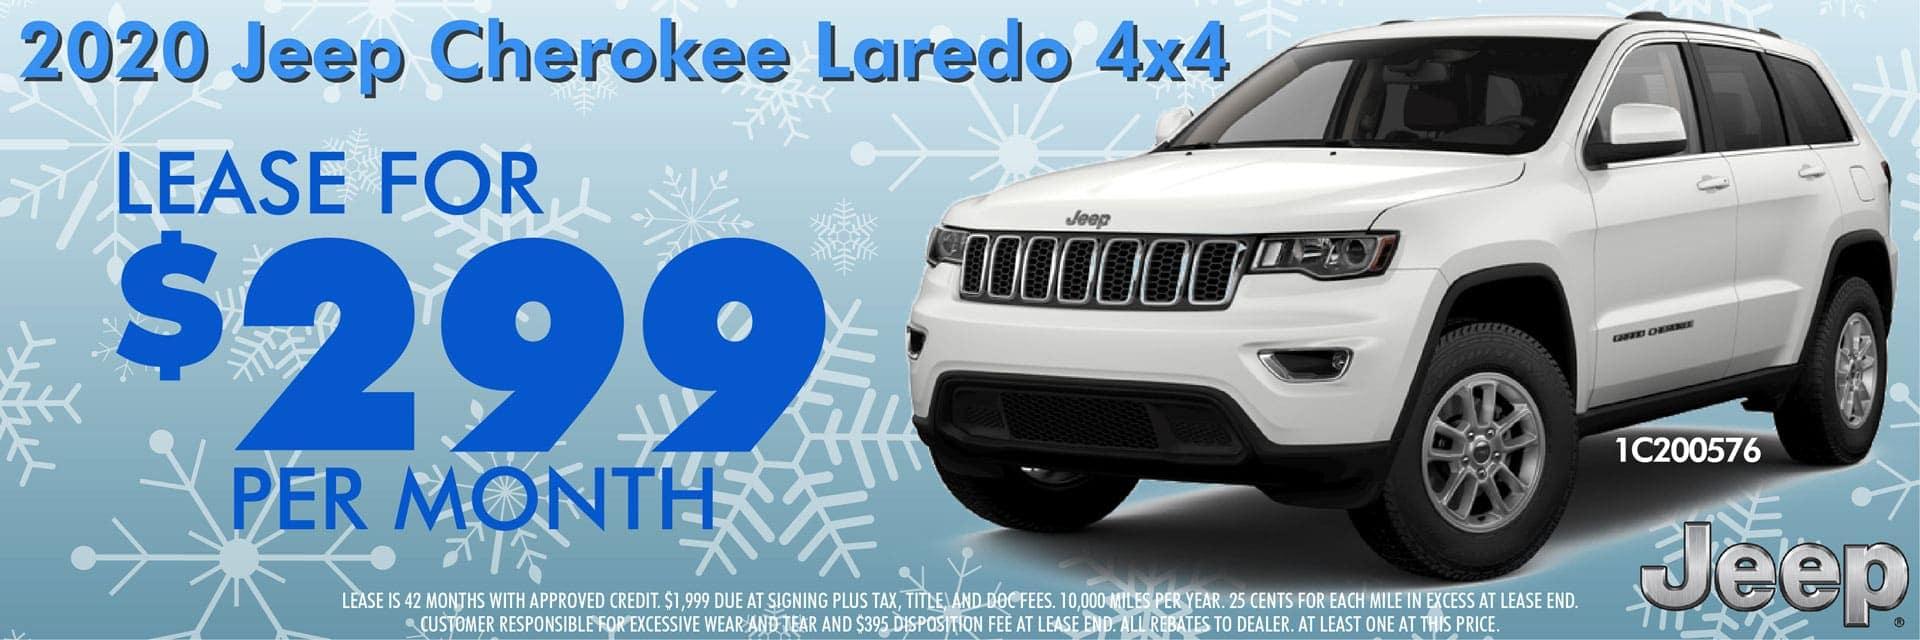 2020 Jeep Cherokee Laredo 4X4